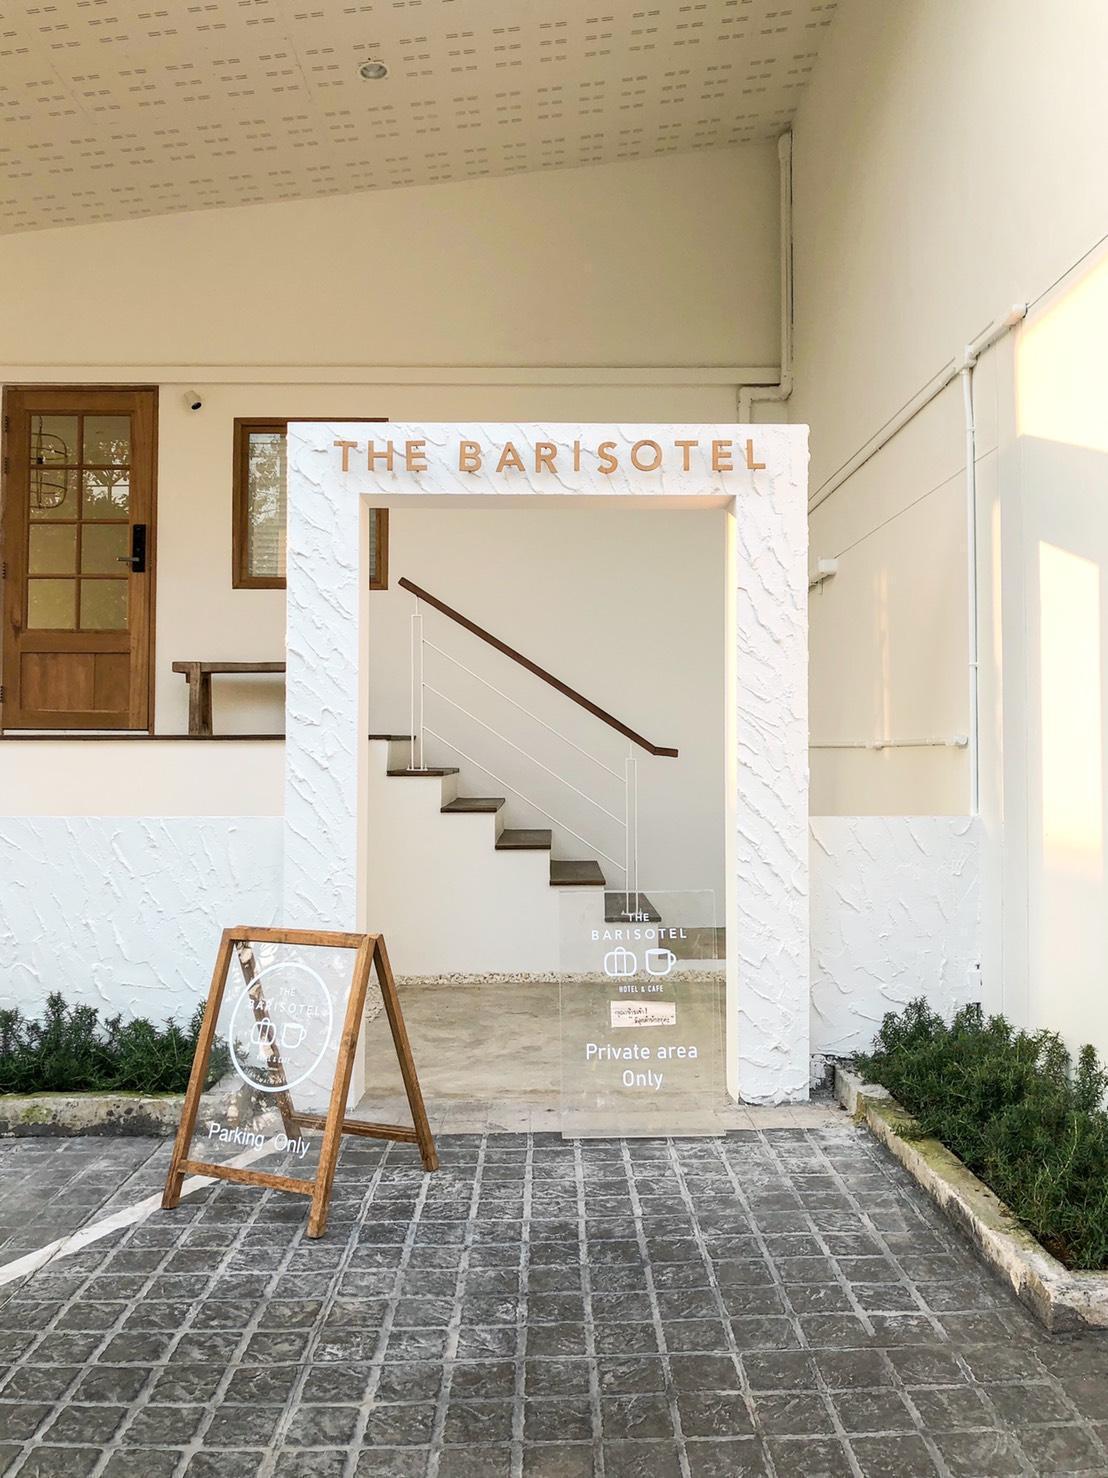 The Barisotel at Transit No.8 เดอะบาริสโซเทล แอด ทรานซิส นัมเบอร์ 8